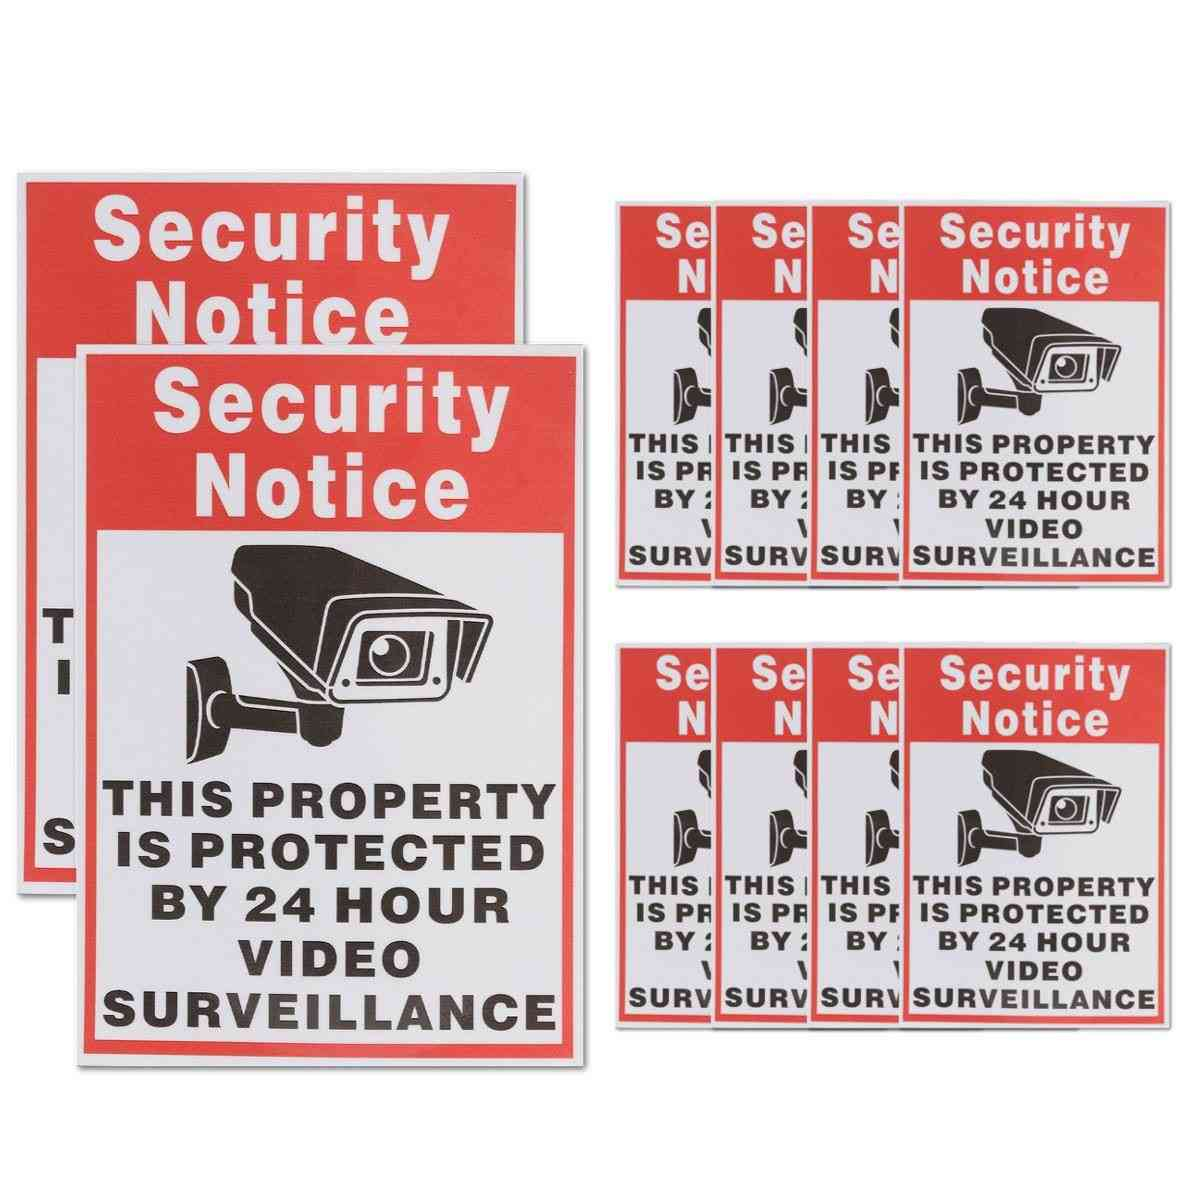 Waterproof Sunscreen Pvc Home Cctv Video Surveillance Security Camera Alarm Sticker